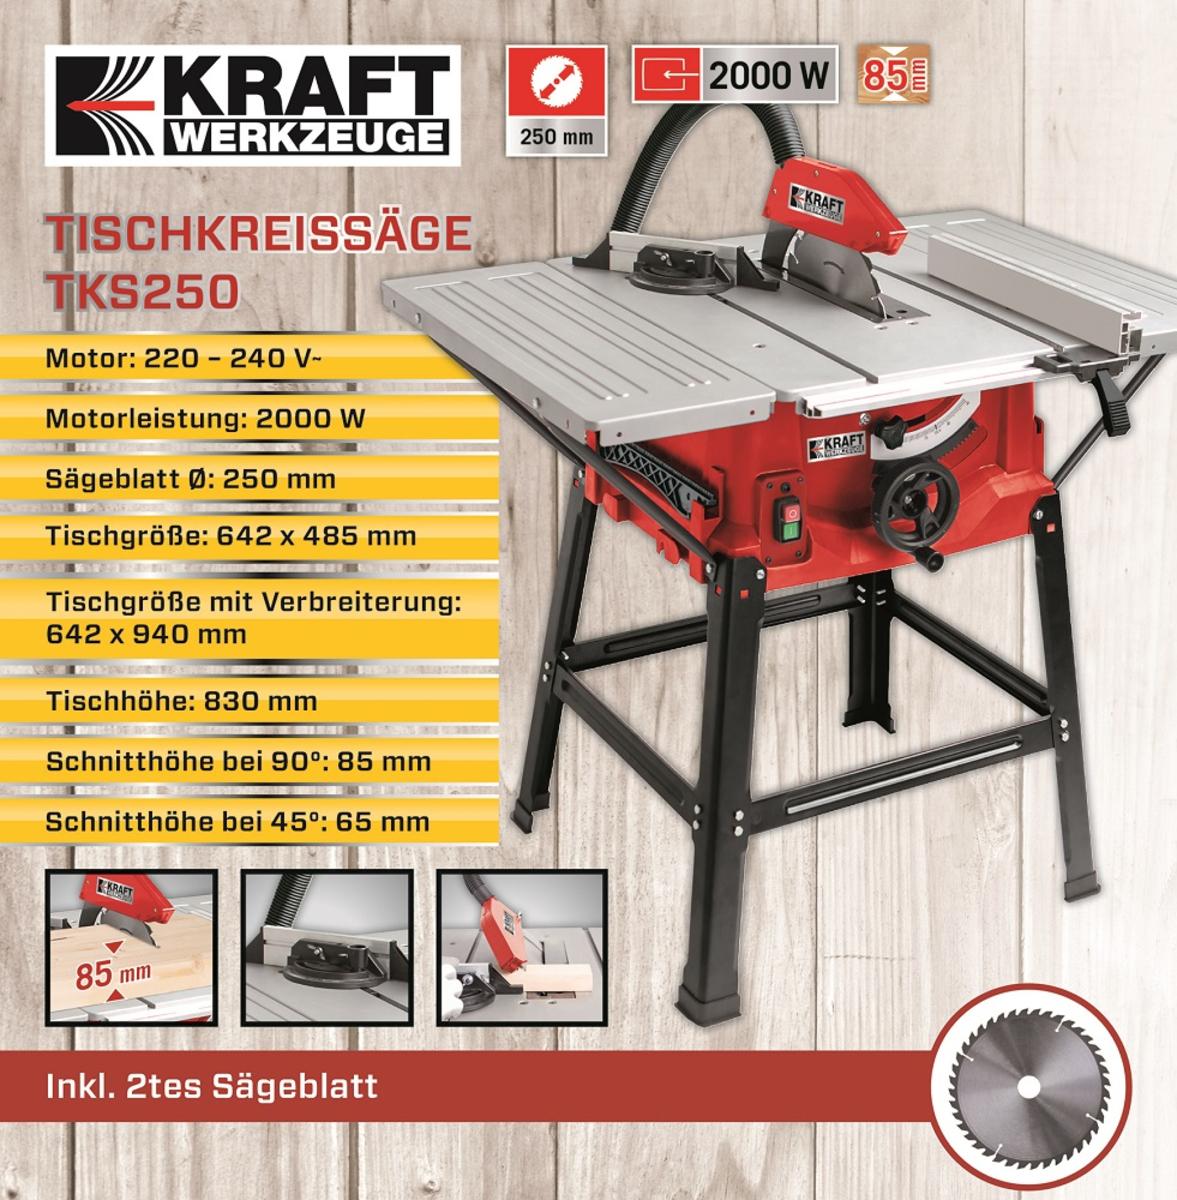 Bild 1 von Kraft Werkzeuge Tischkreissäge TKS250 inkl. 2. Sägeblatt